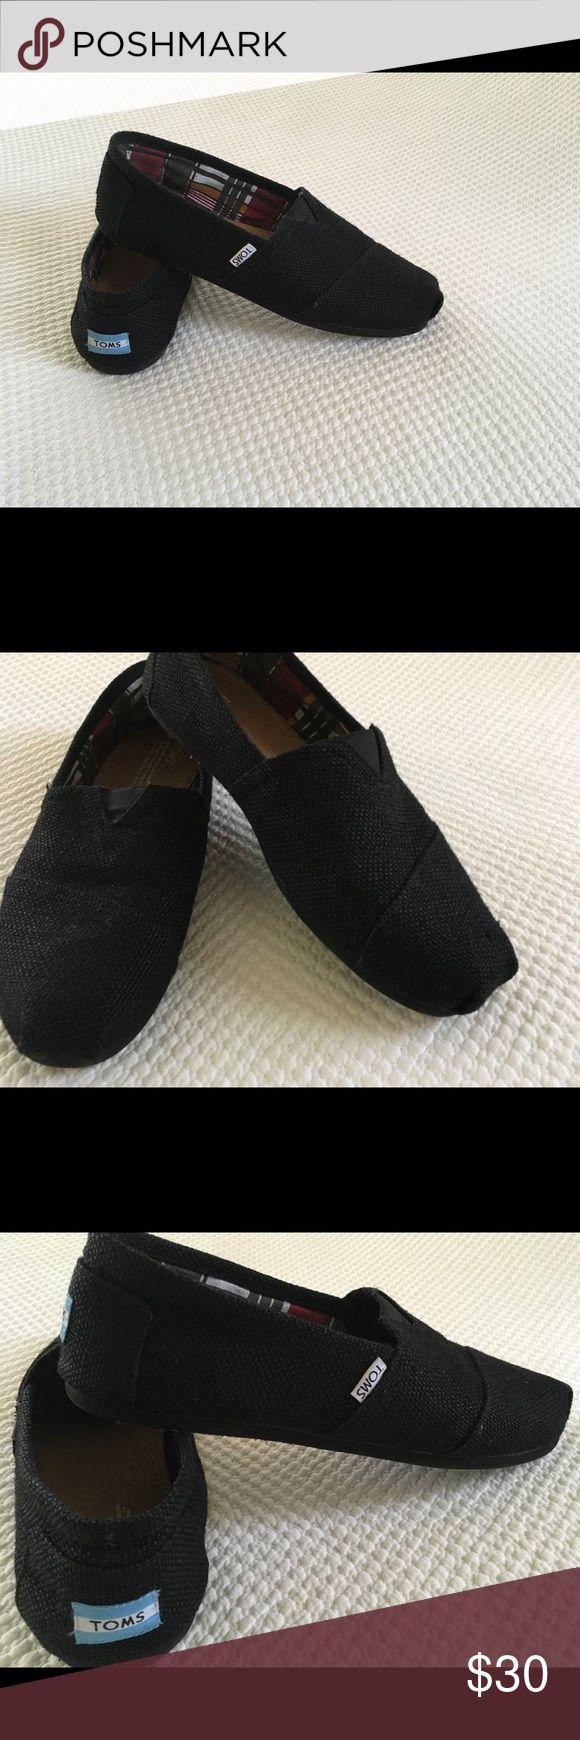 Men's shoes Brand New...never worn Black Tom's for men Tom's Shoes Loafers & Slip-Ons